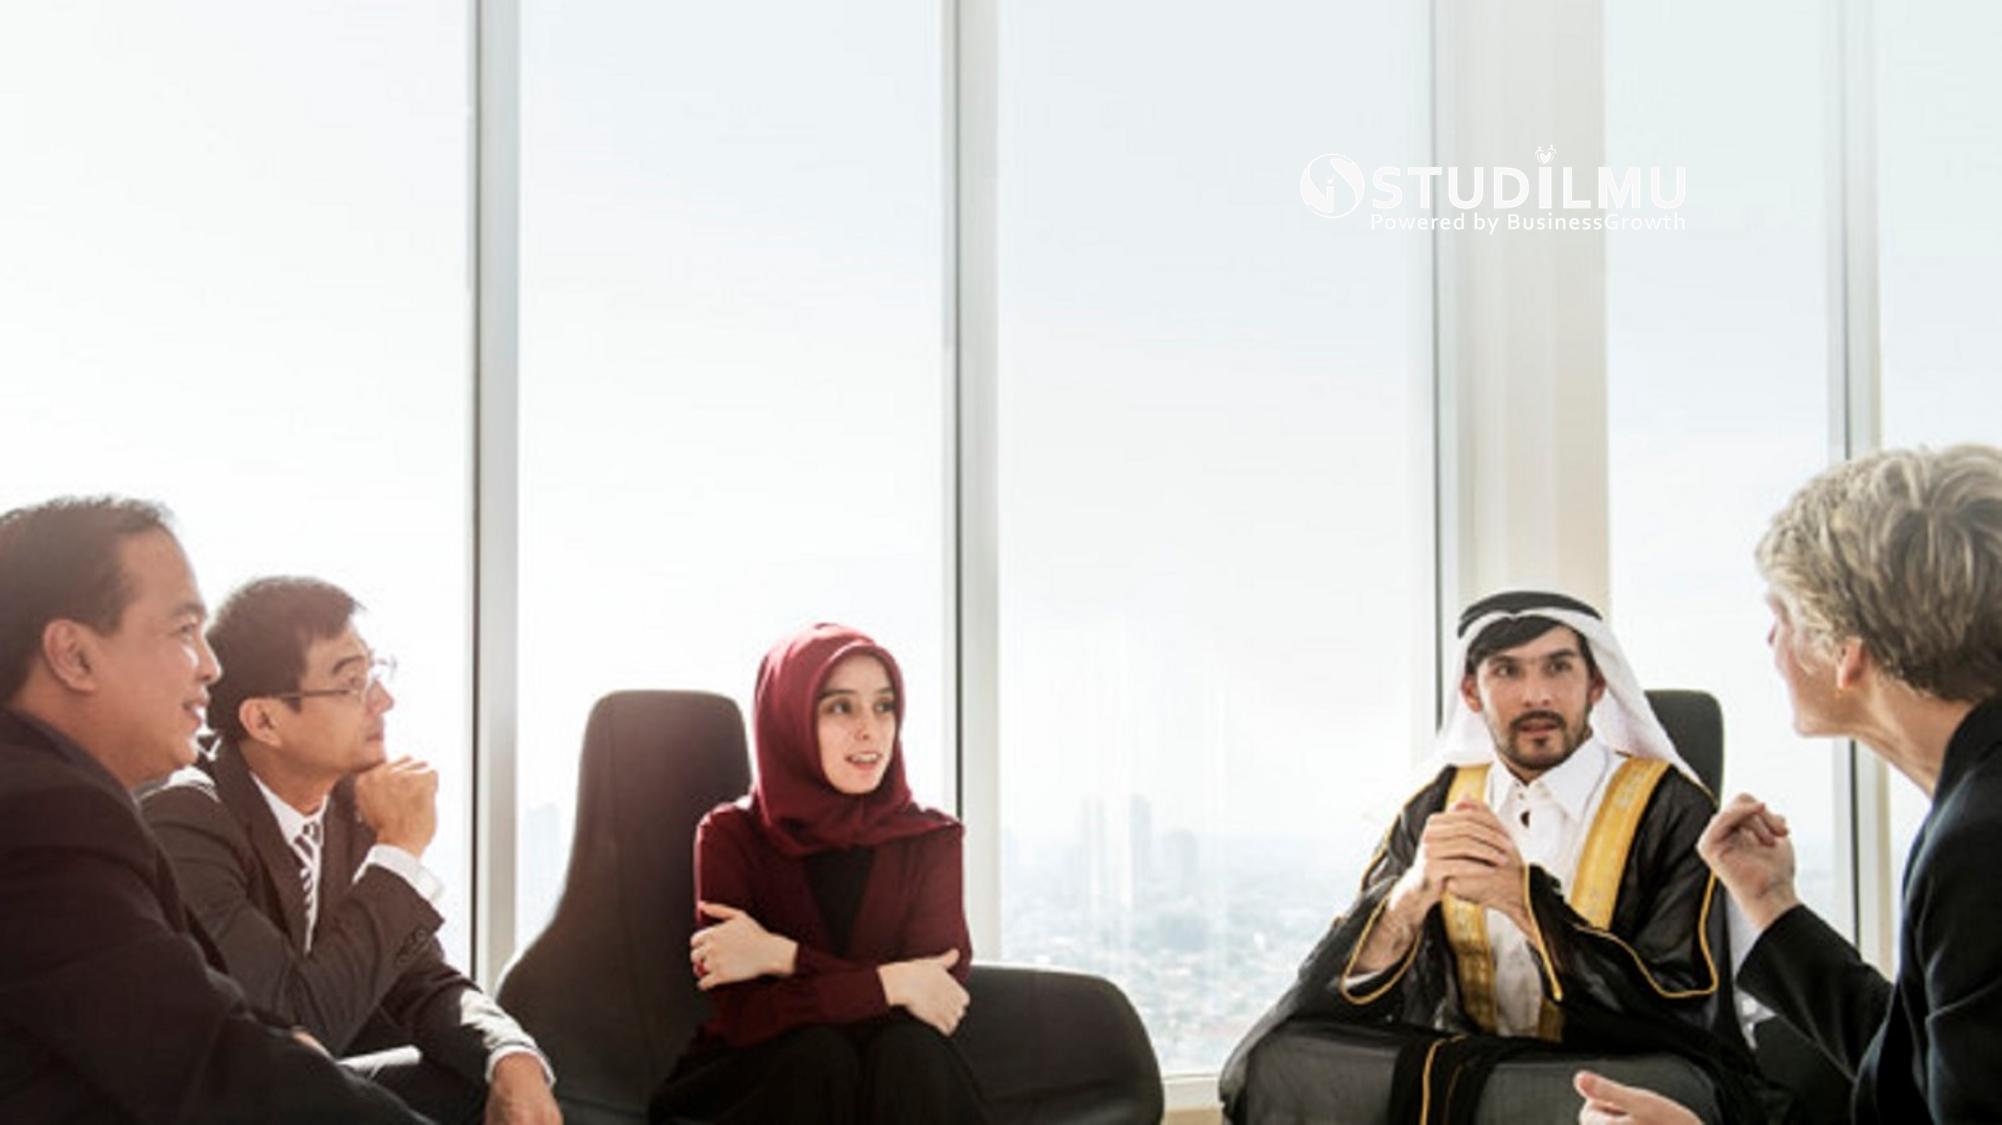 STUDILMU Career Advice - 3 Bentuk Budaya Organisasi